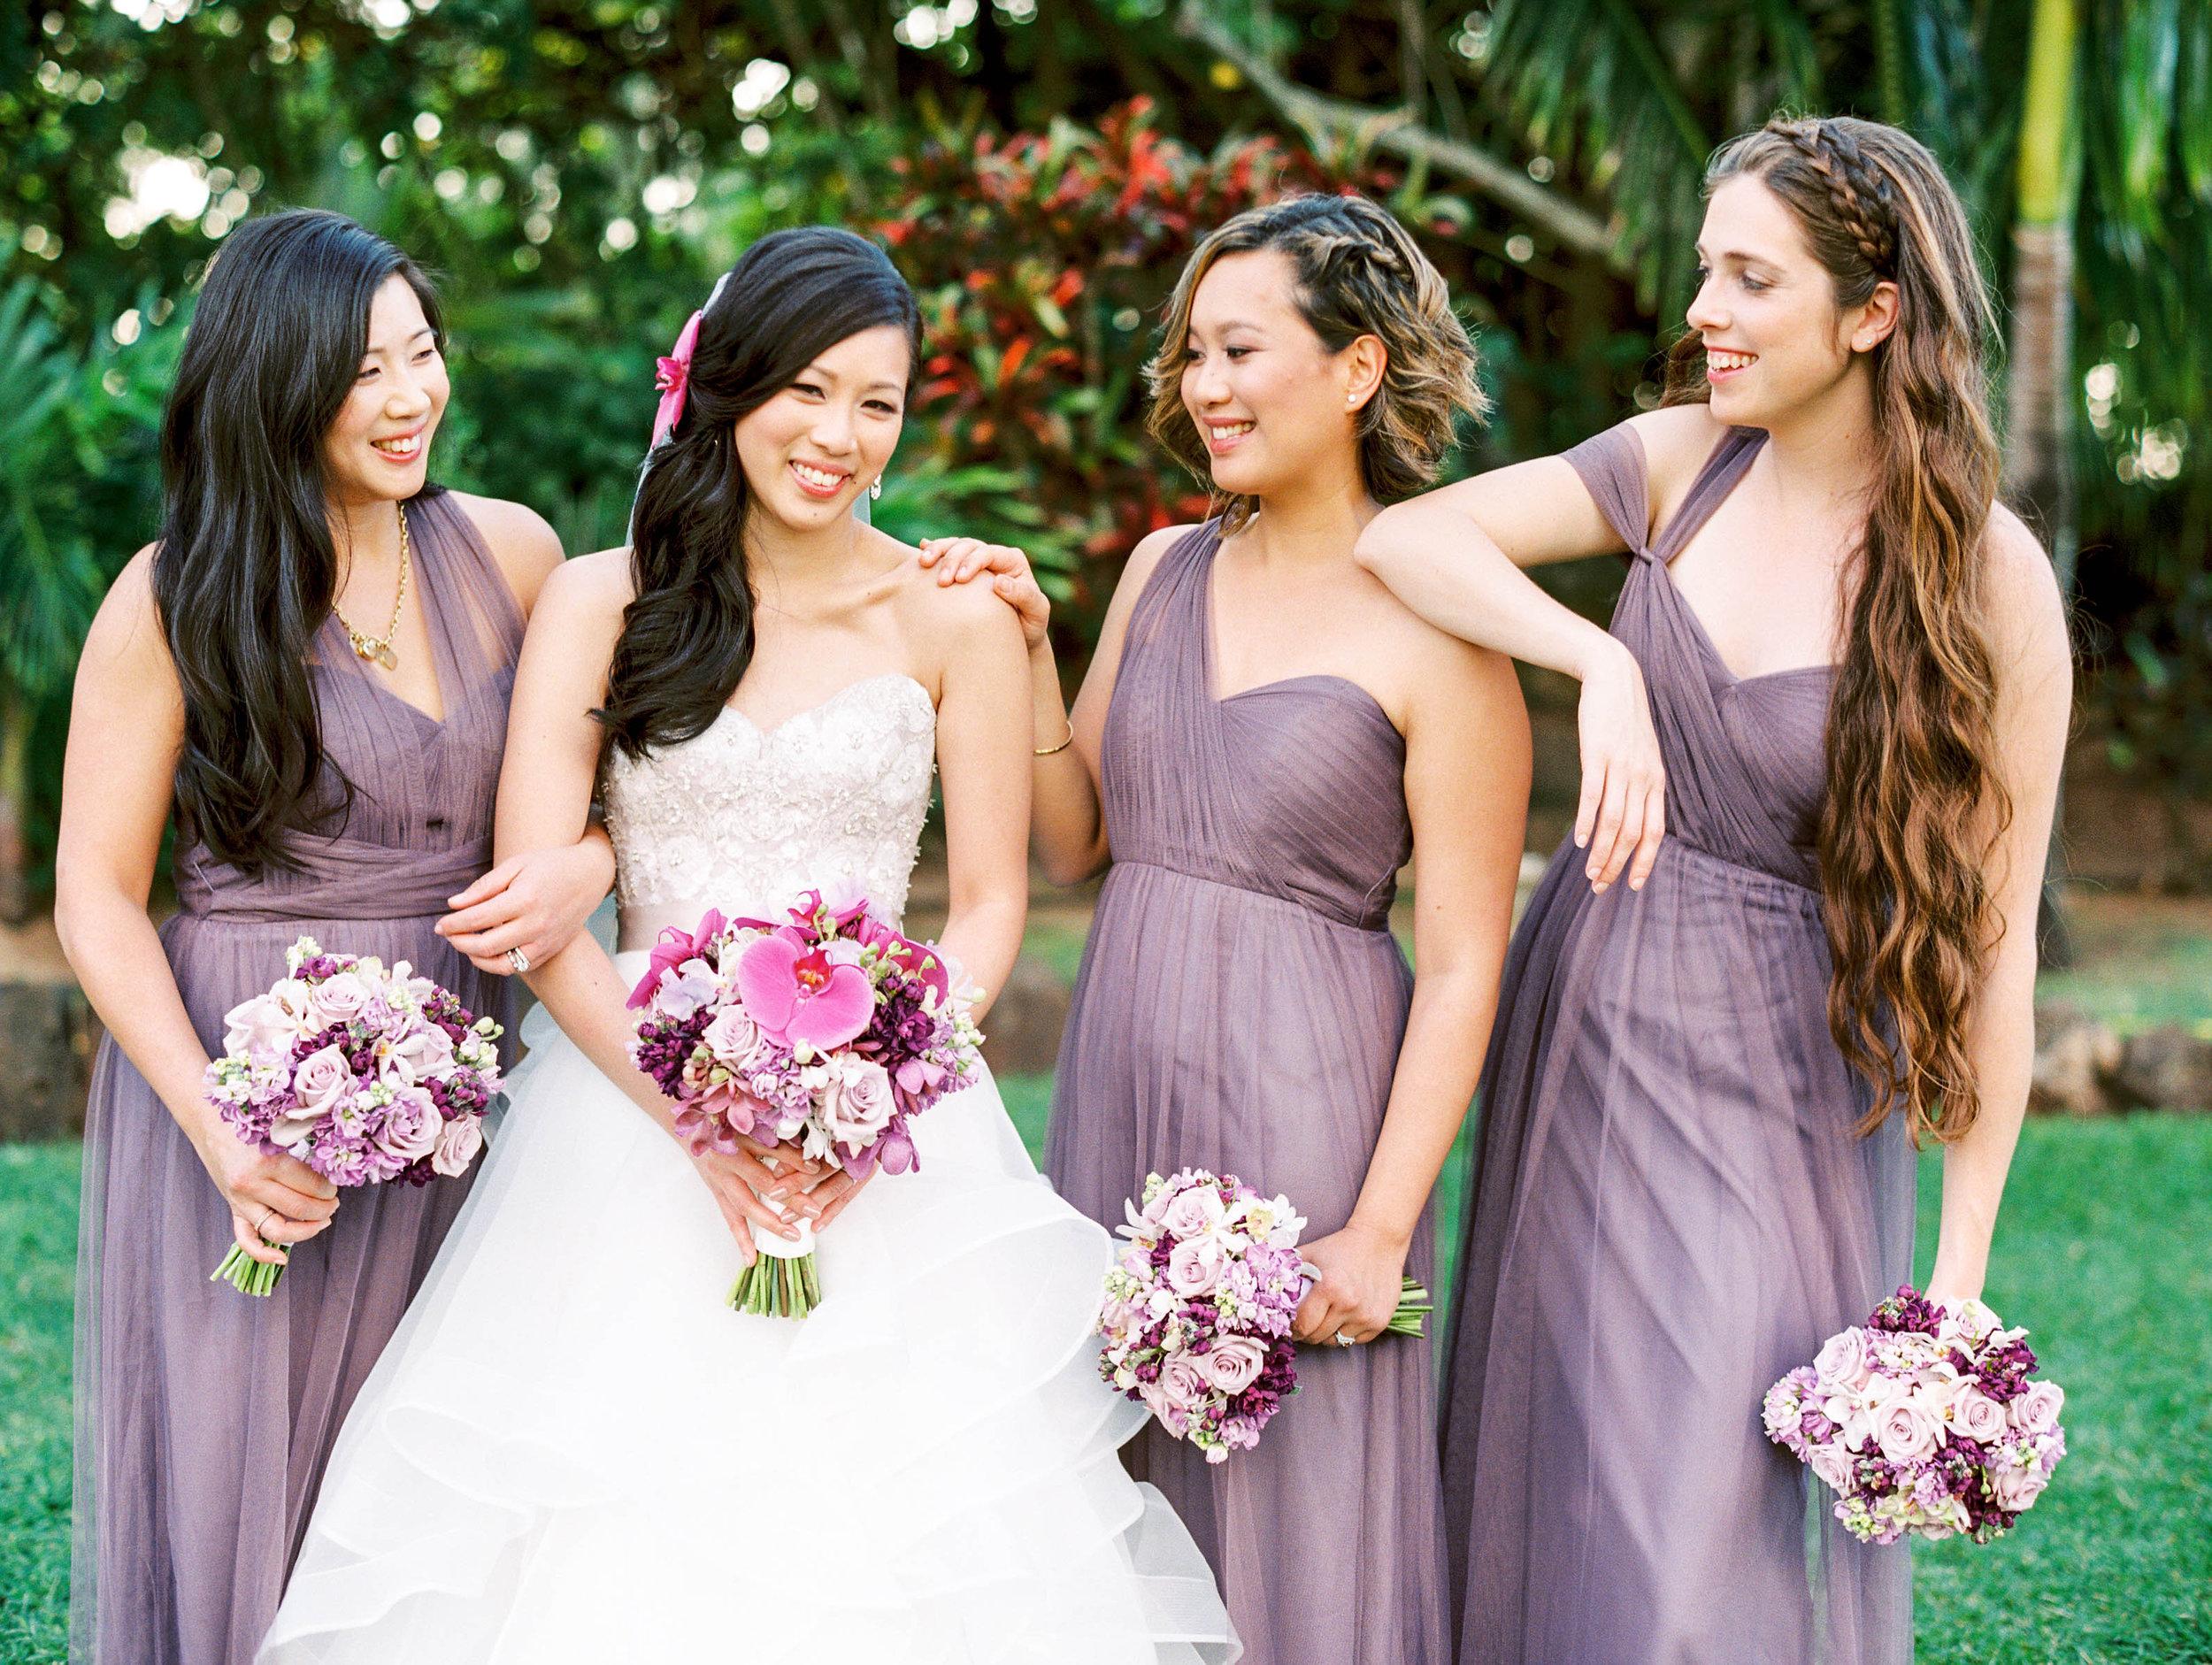 Michelle Garibay Events | Elegant Oahu Wedding | Loulu Palm Estate | Purple Bridesmaid Dresses